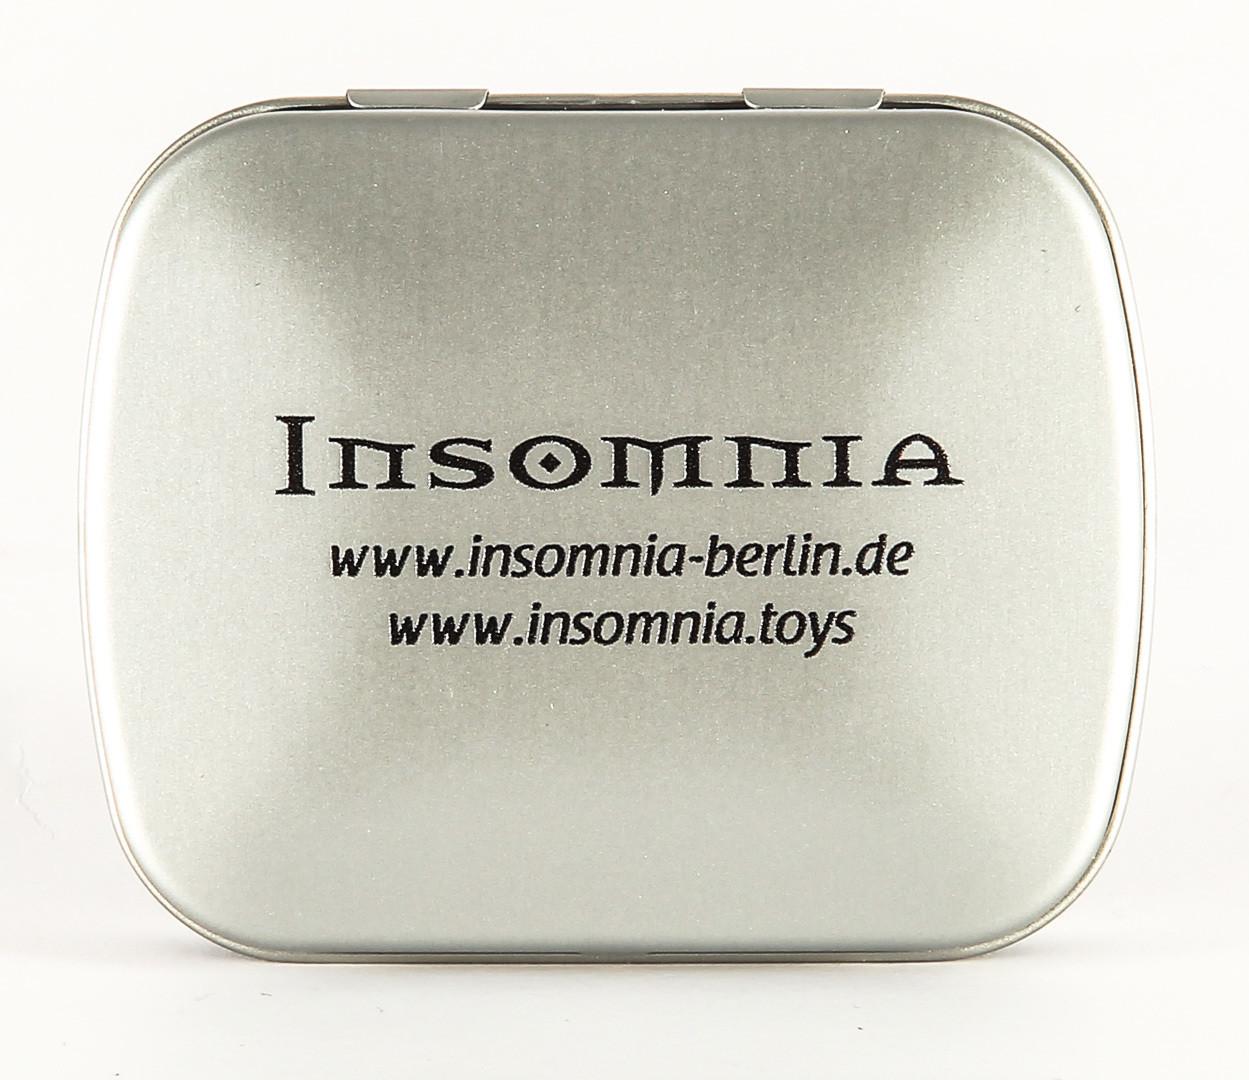 Insomnia Minzbox